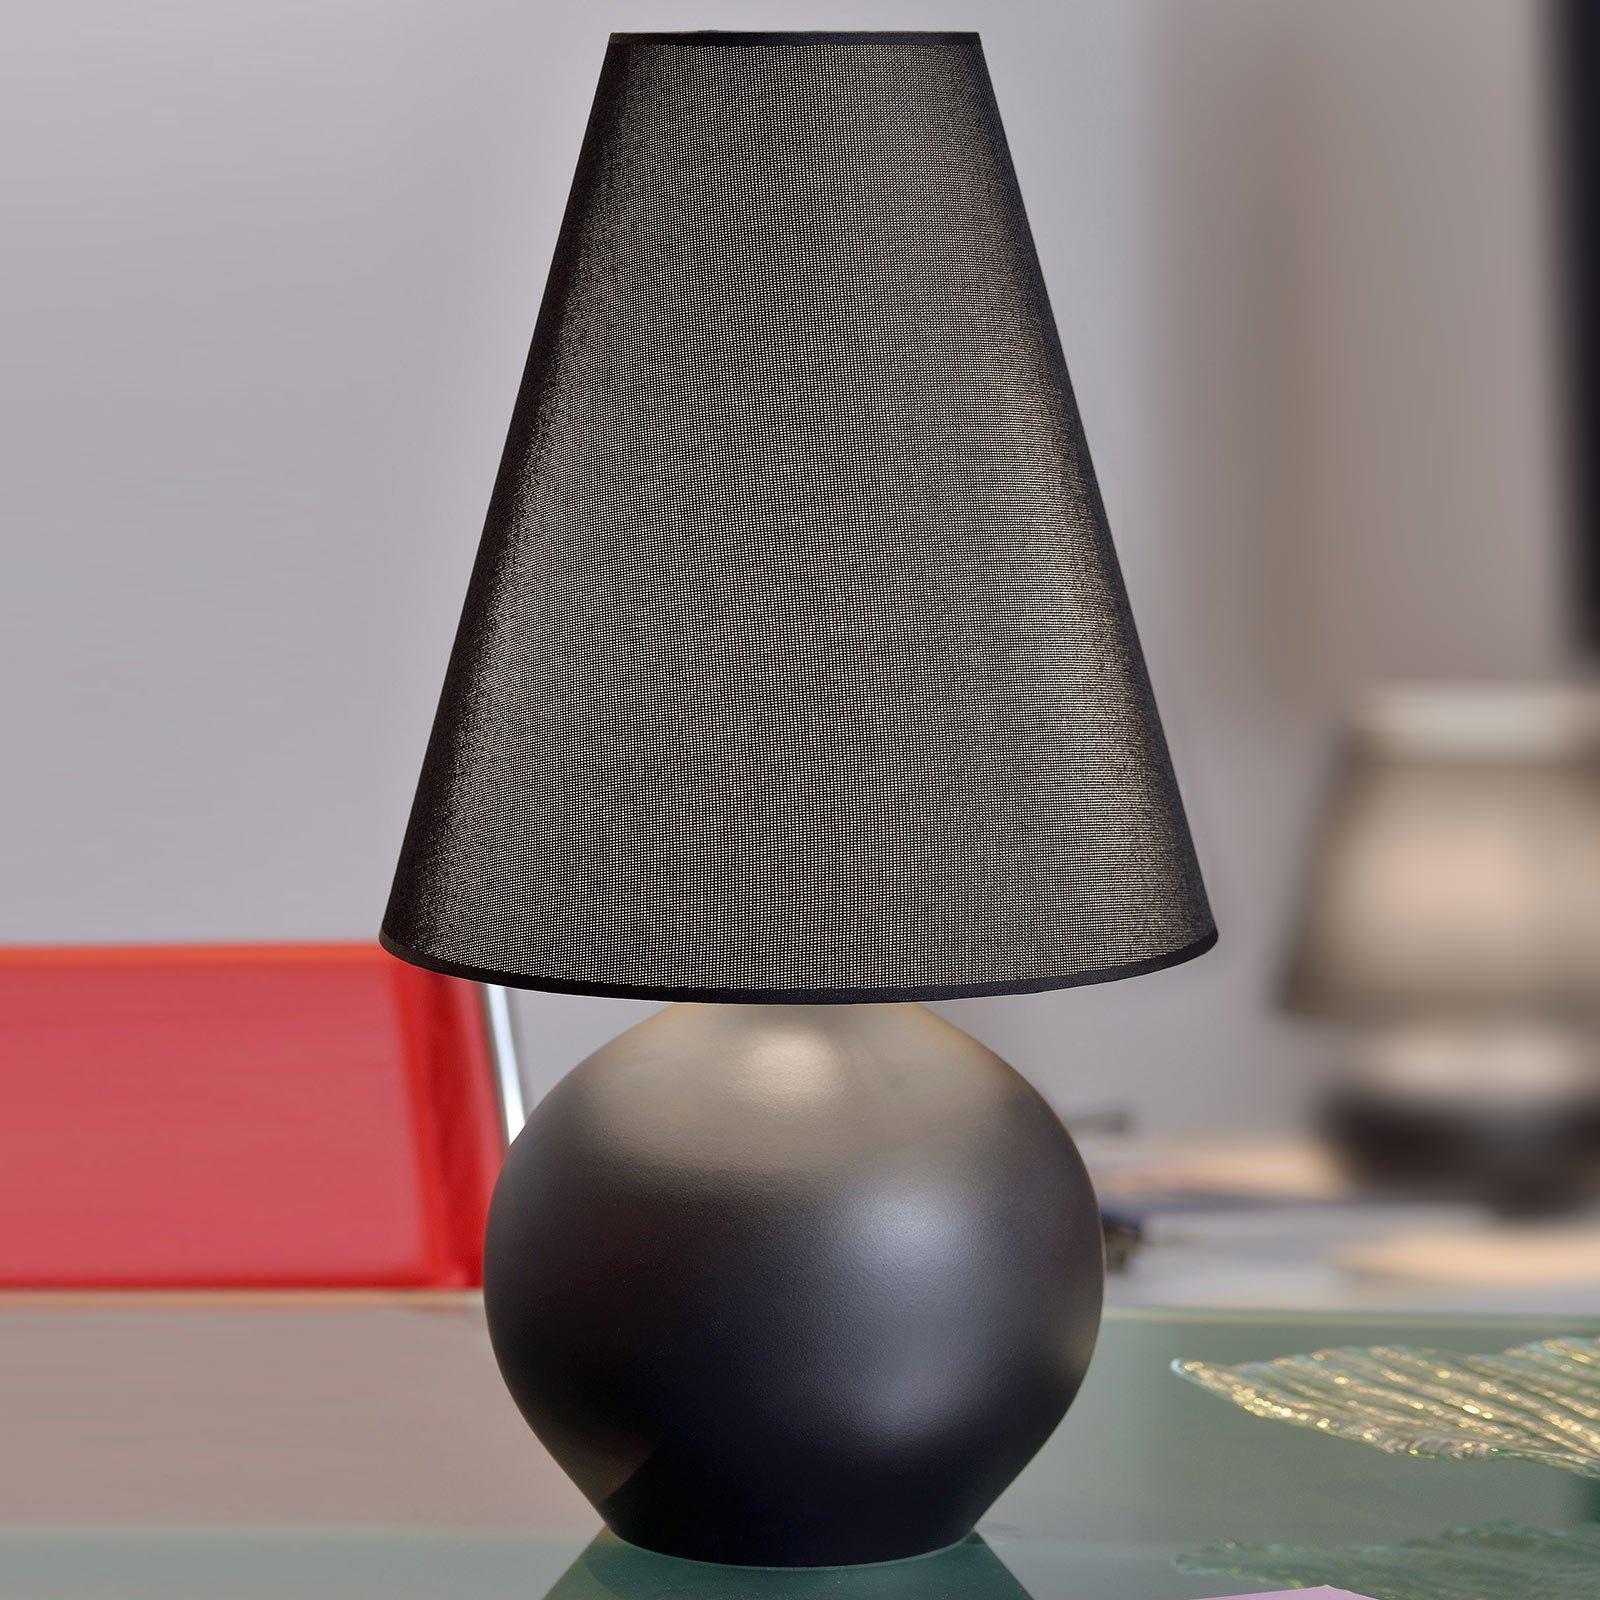 Bordlampe Sfera, høyde 44 cm, svart